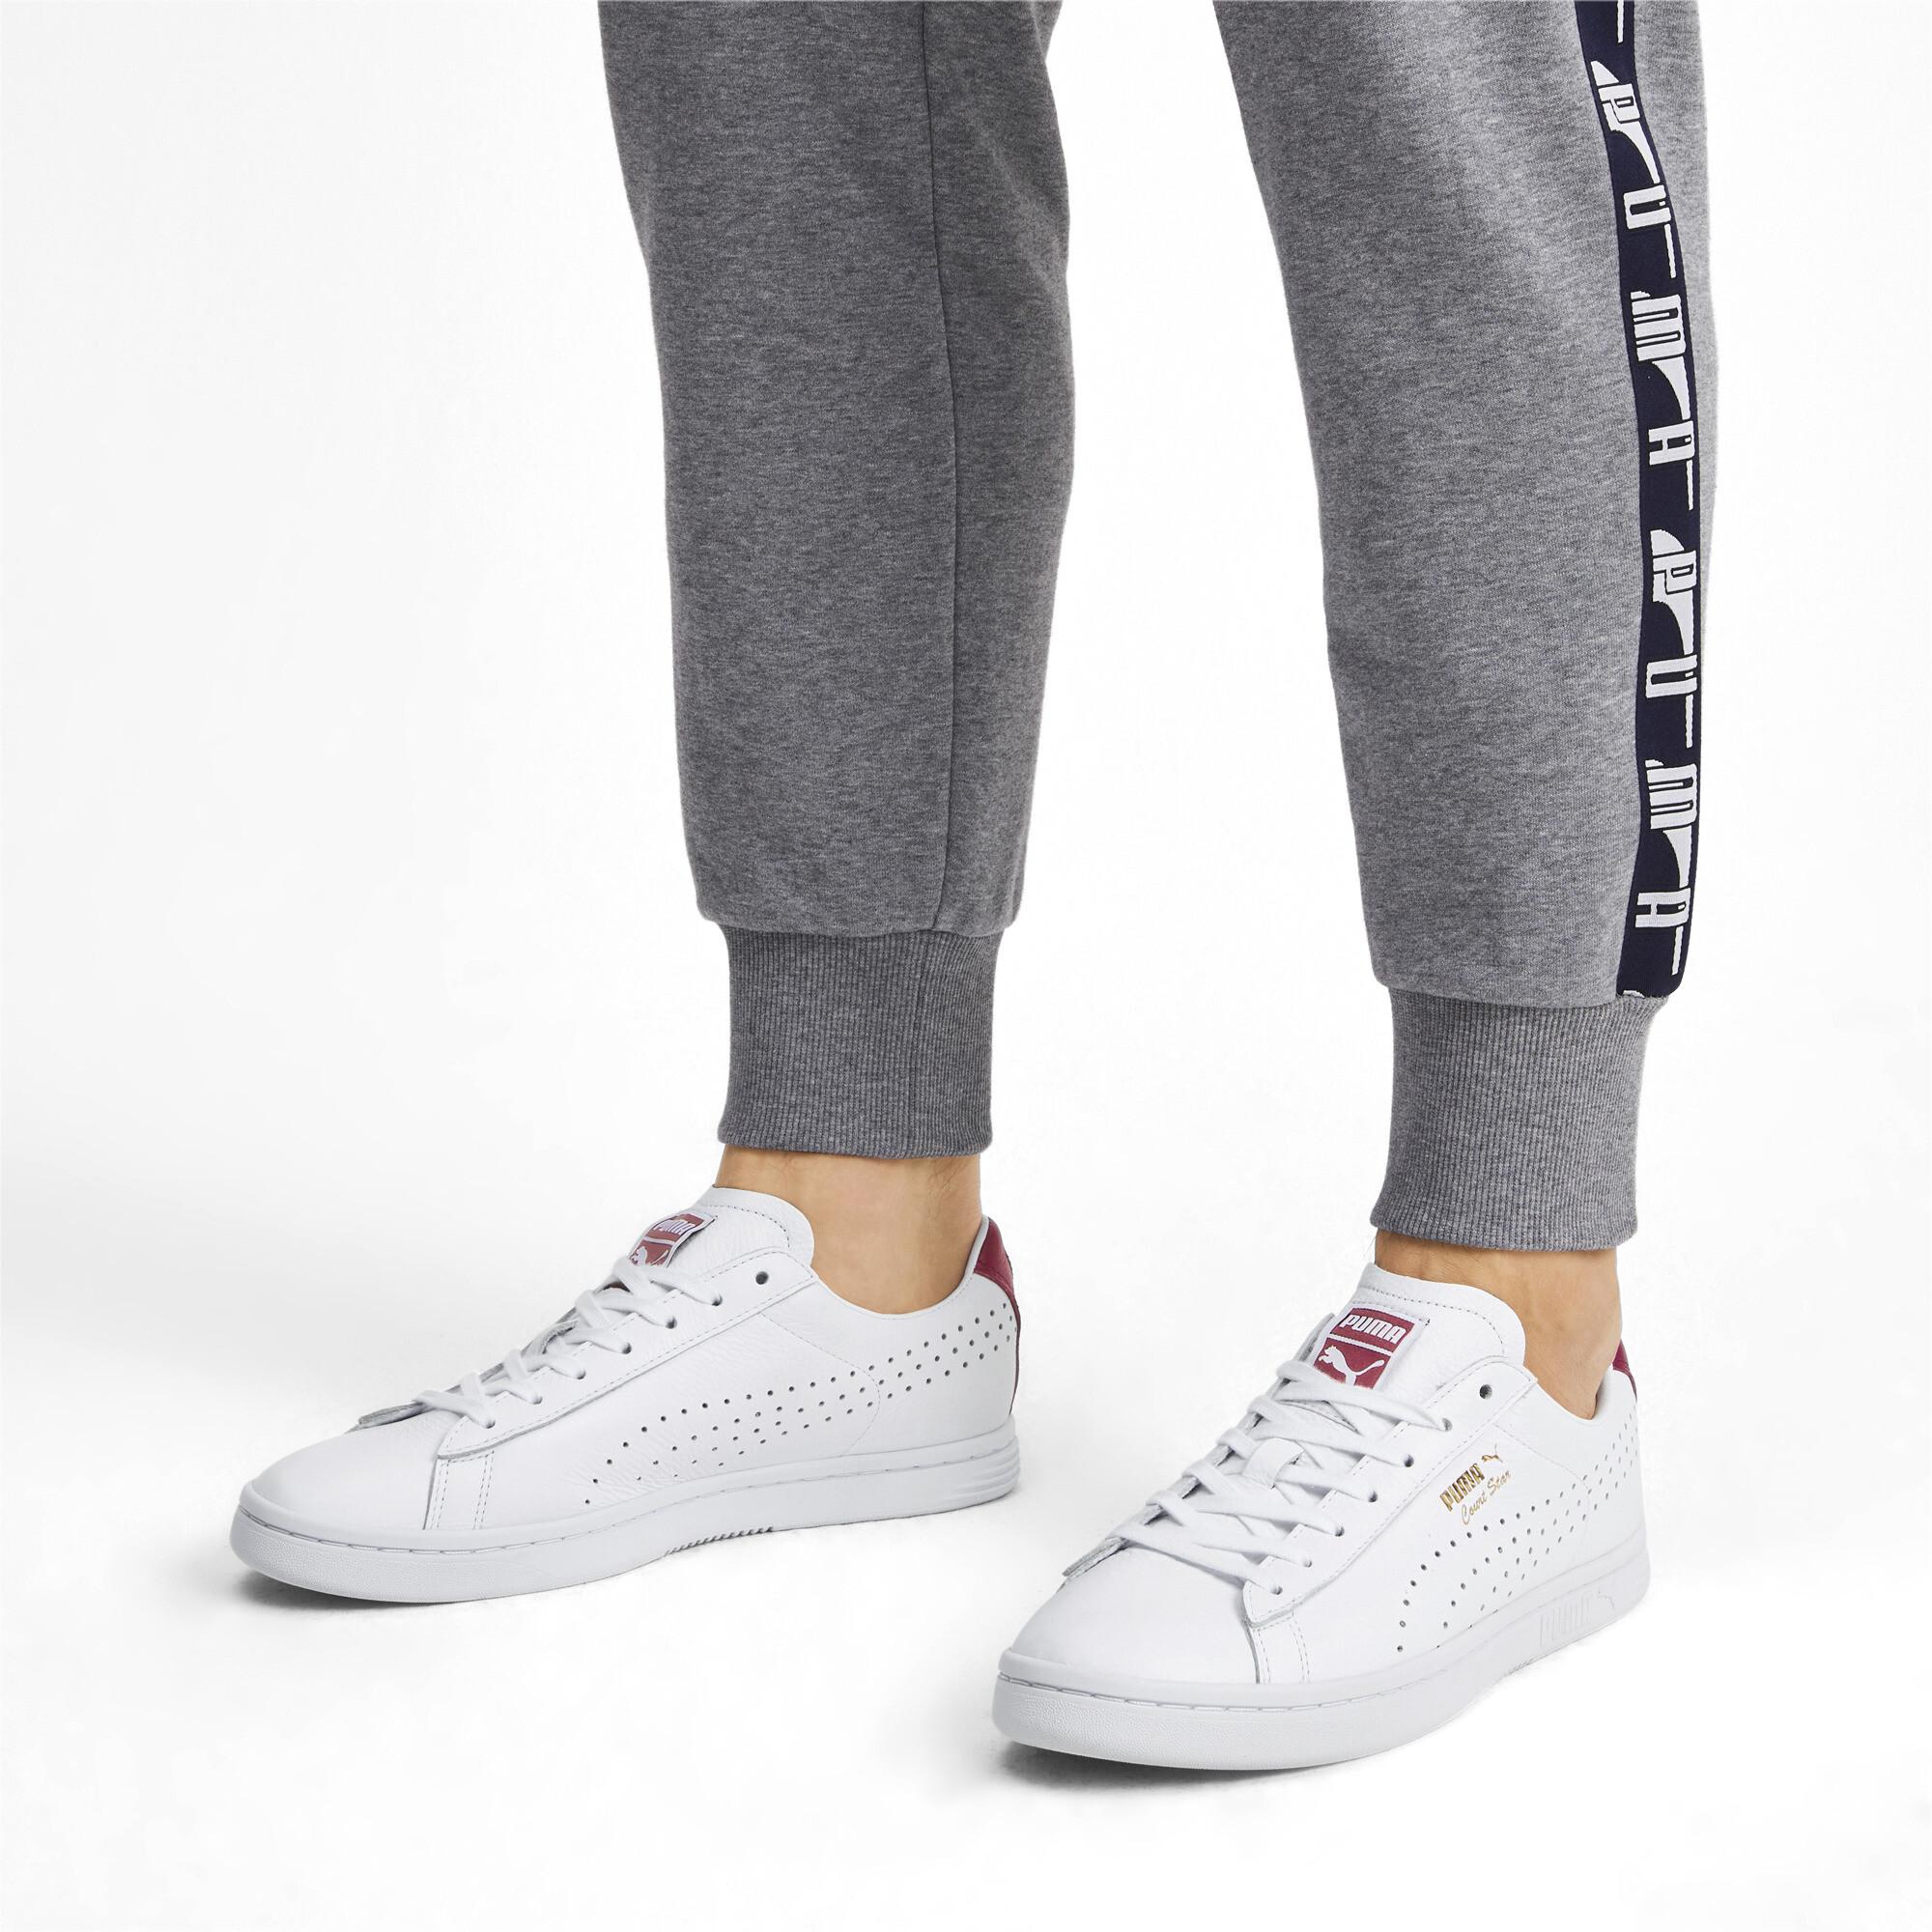 PUMA-Court-Star-Men-039-s-Sneakers-Unisex-Shoe-Sport-Classics thumbnail 12